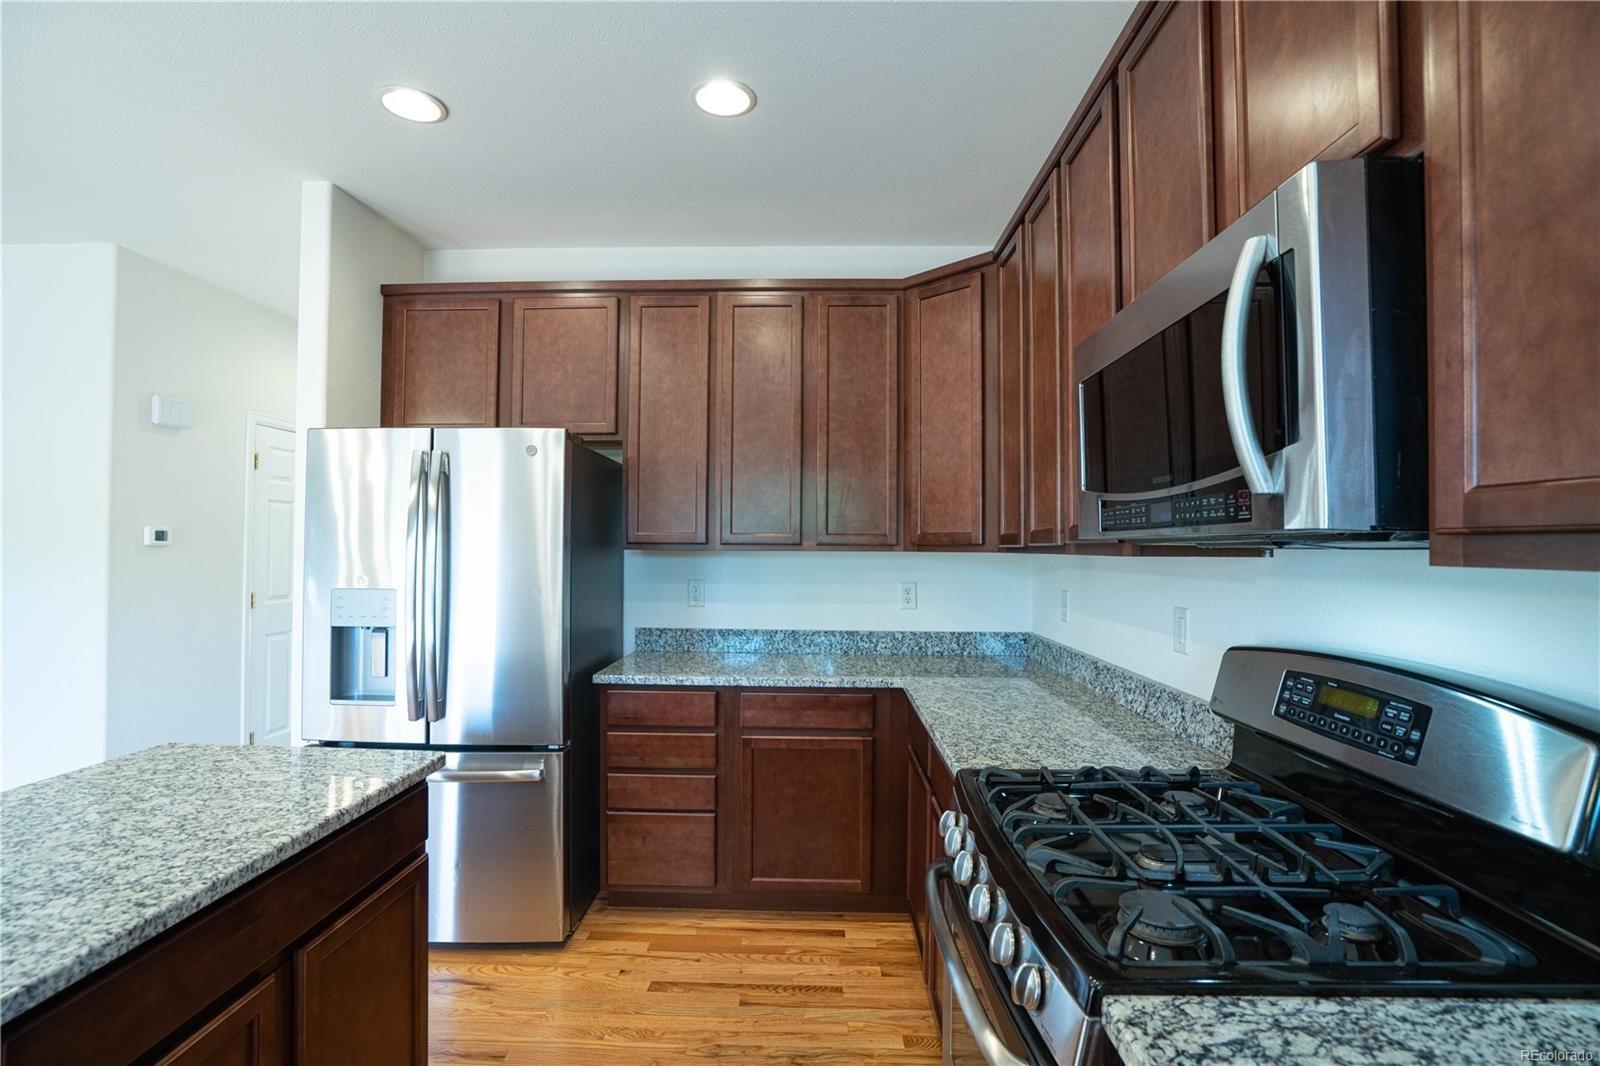 MLS# 7654141 - 8 - 961 Sparrow Hawk Drive, Longmont, CO 80504